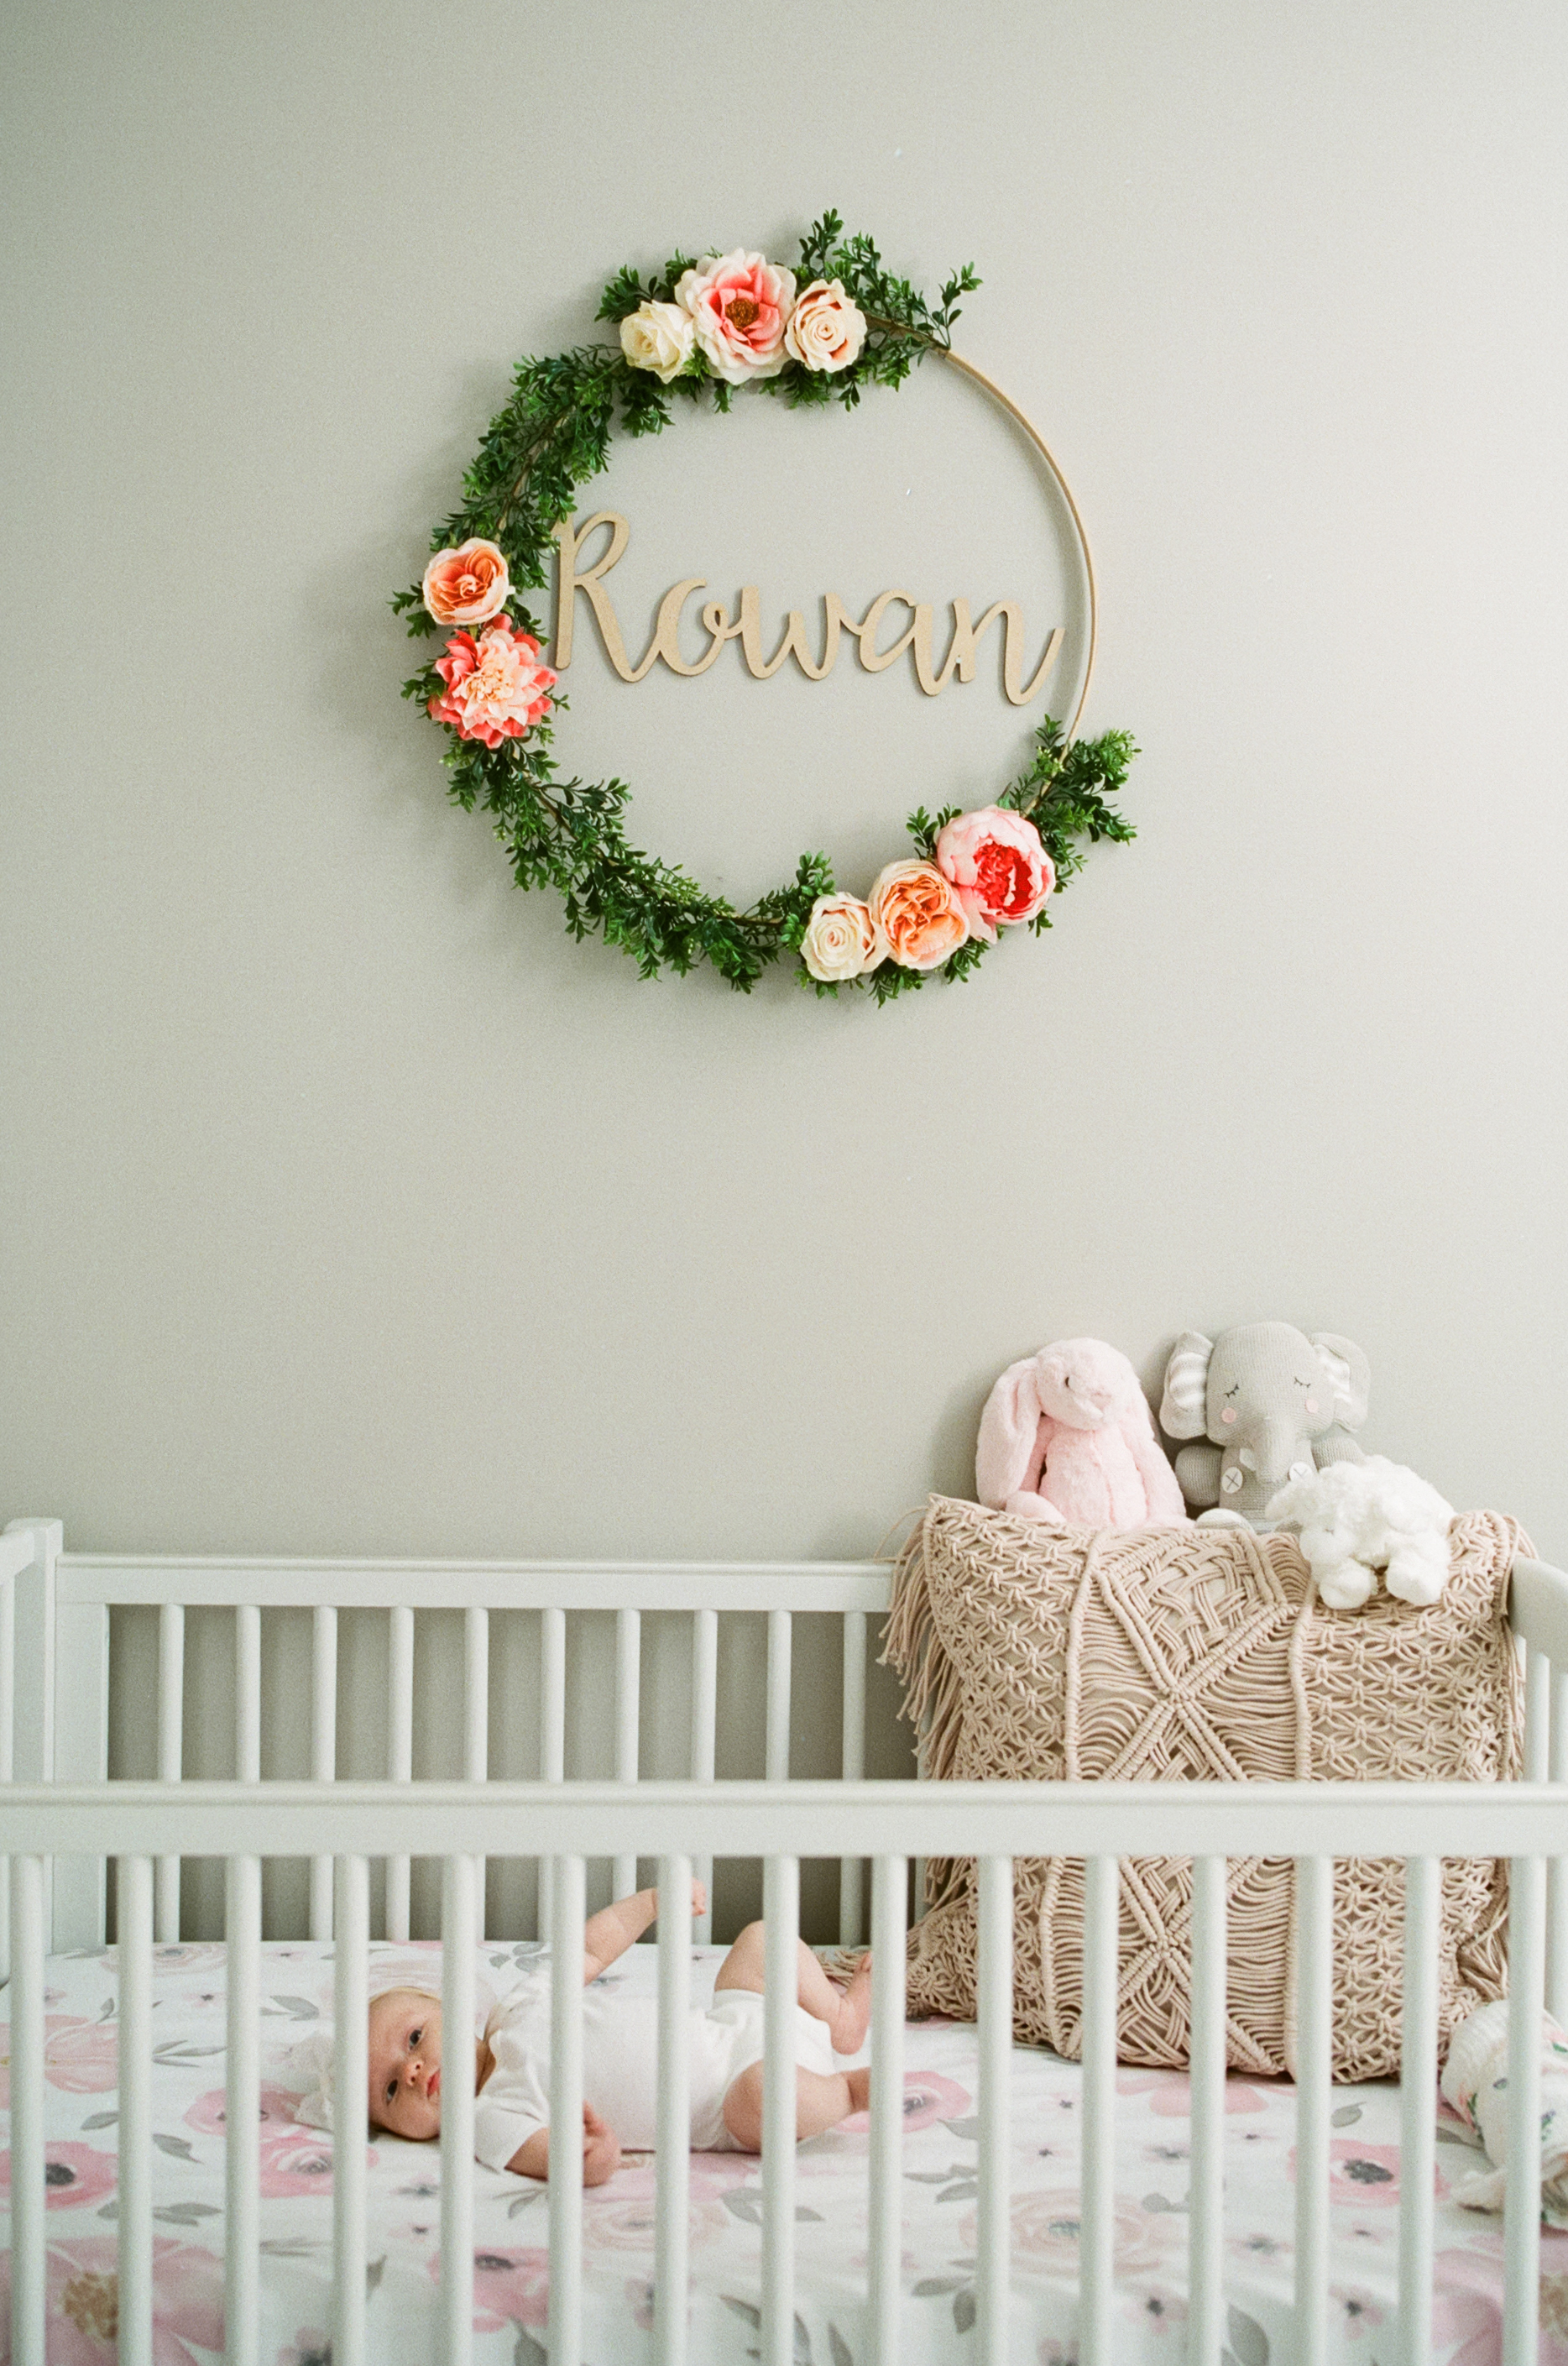 raleigh-lifestyle-newborn-photographer-six-weeks-old-nursery